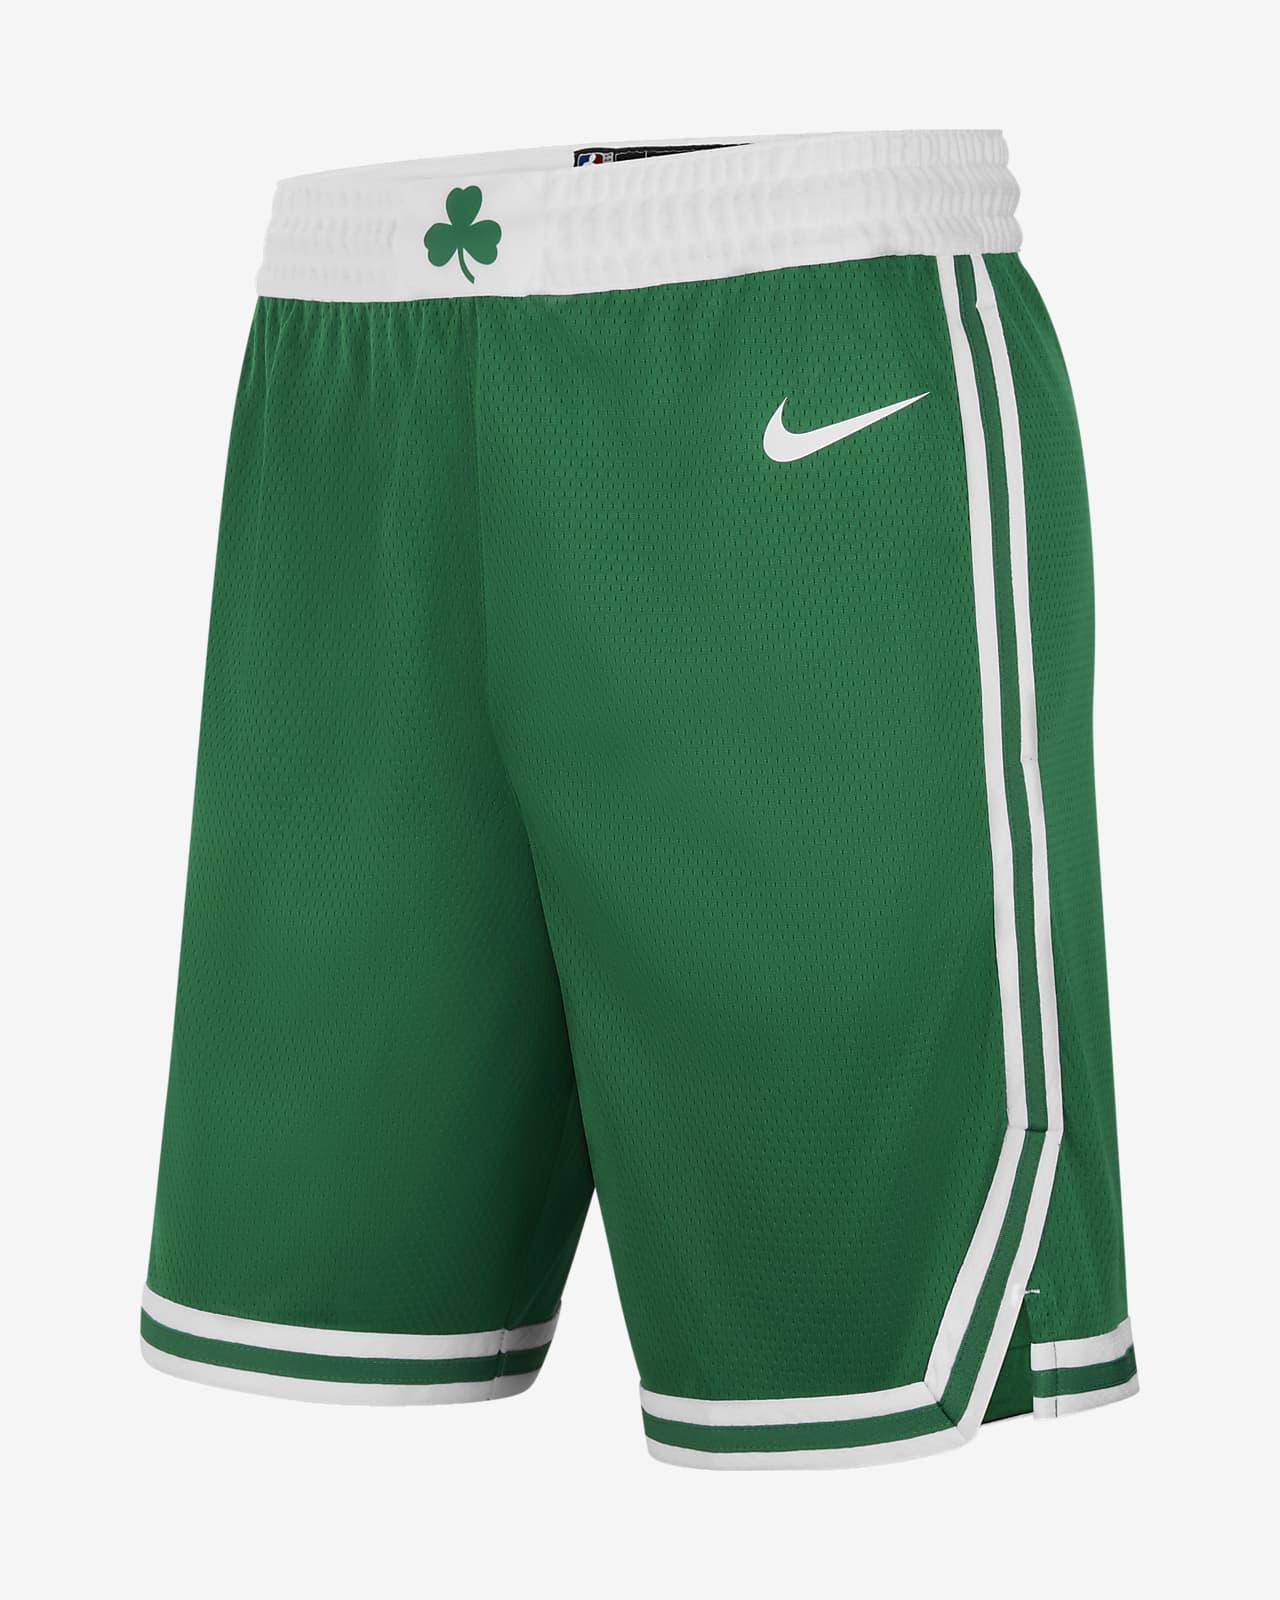 Calções NBA Nike Swingman Boston Celtics Icon Edition para homem